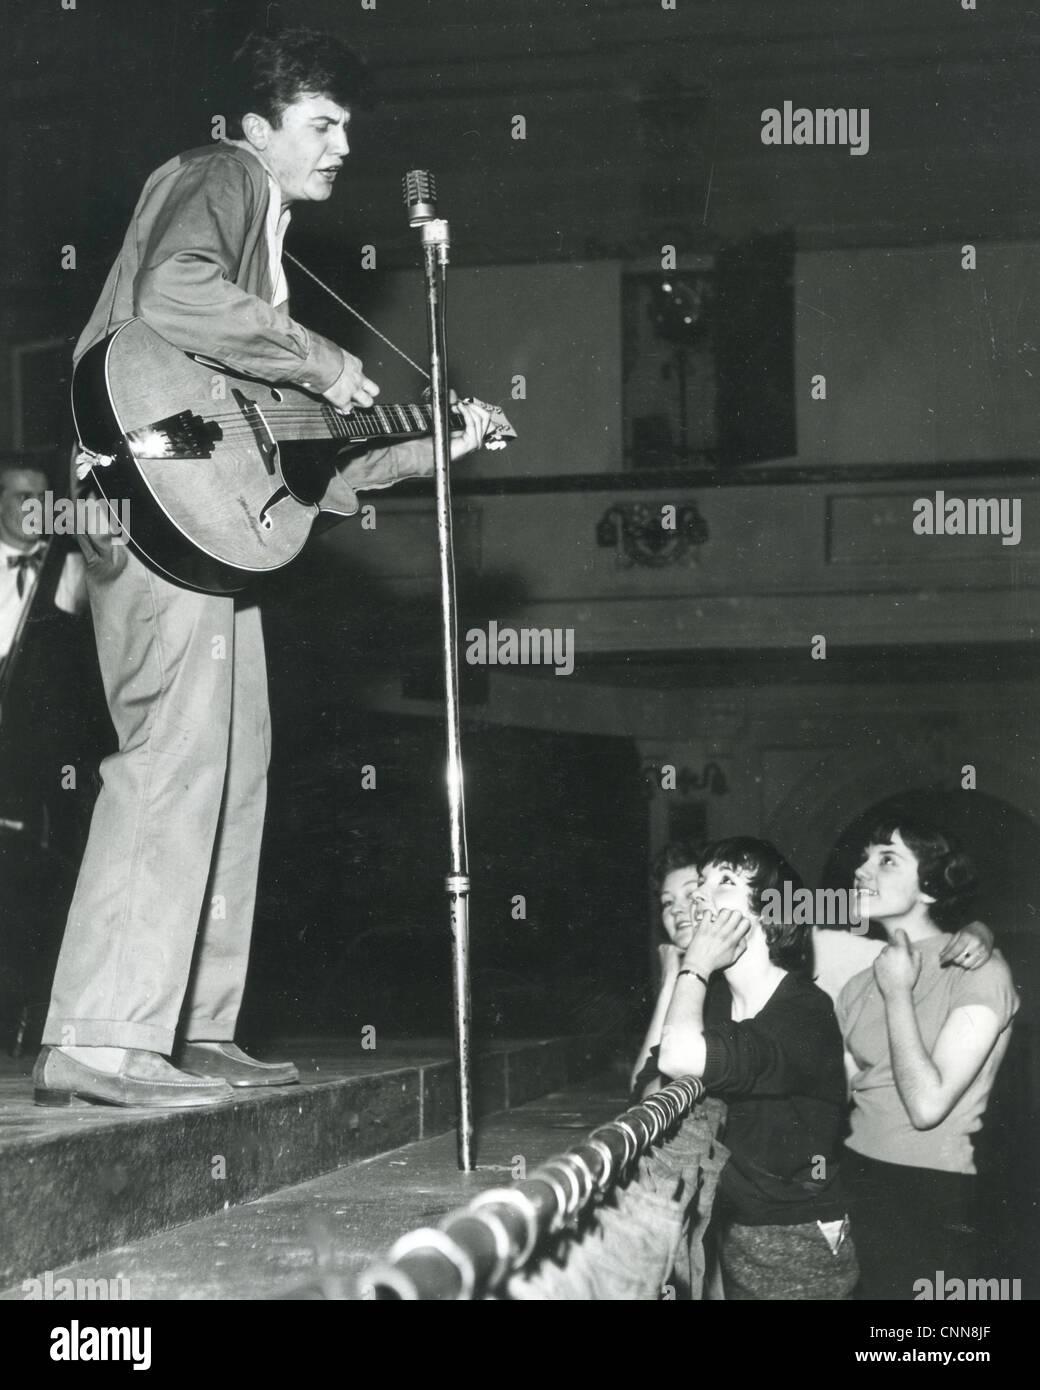 TERRY DENE UK-Pop-Sängerin an der Civic Hall, Croydon, 1958 während der Proben Stockbild